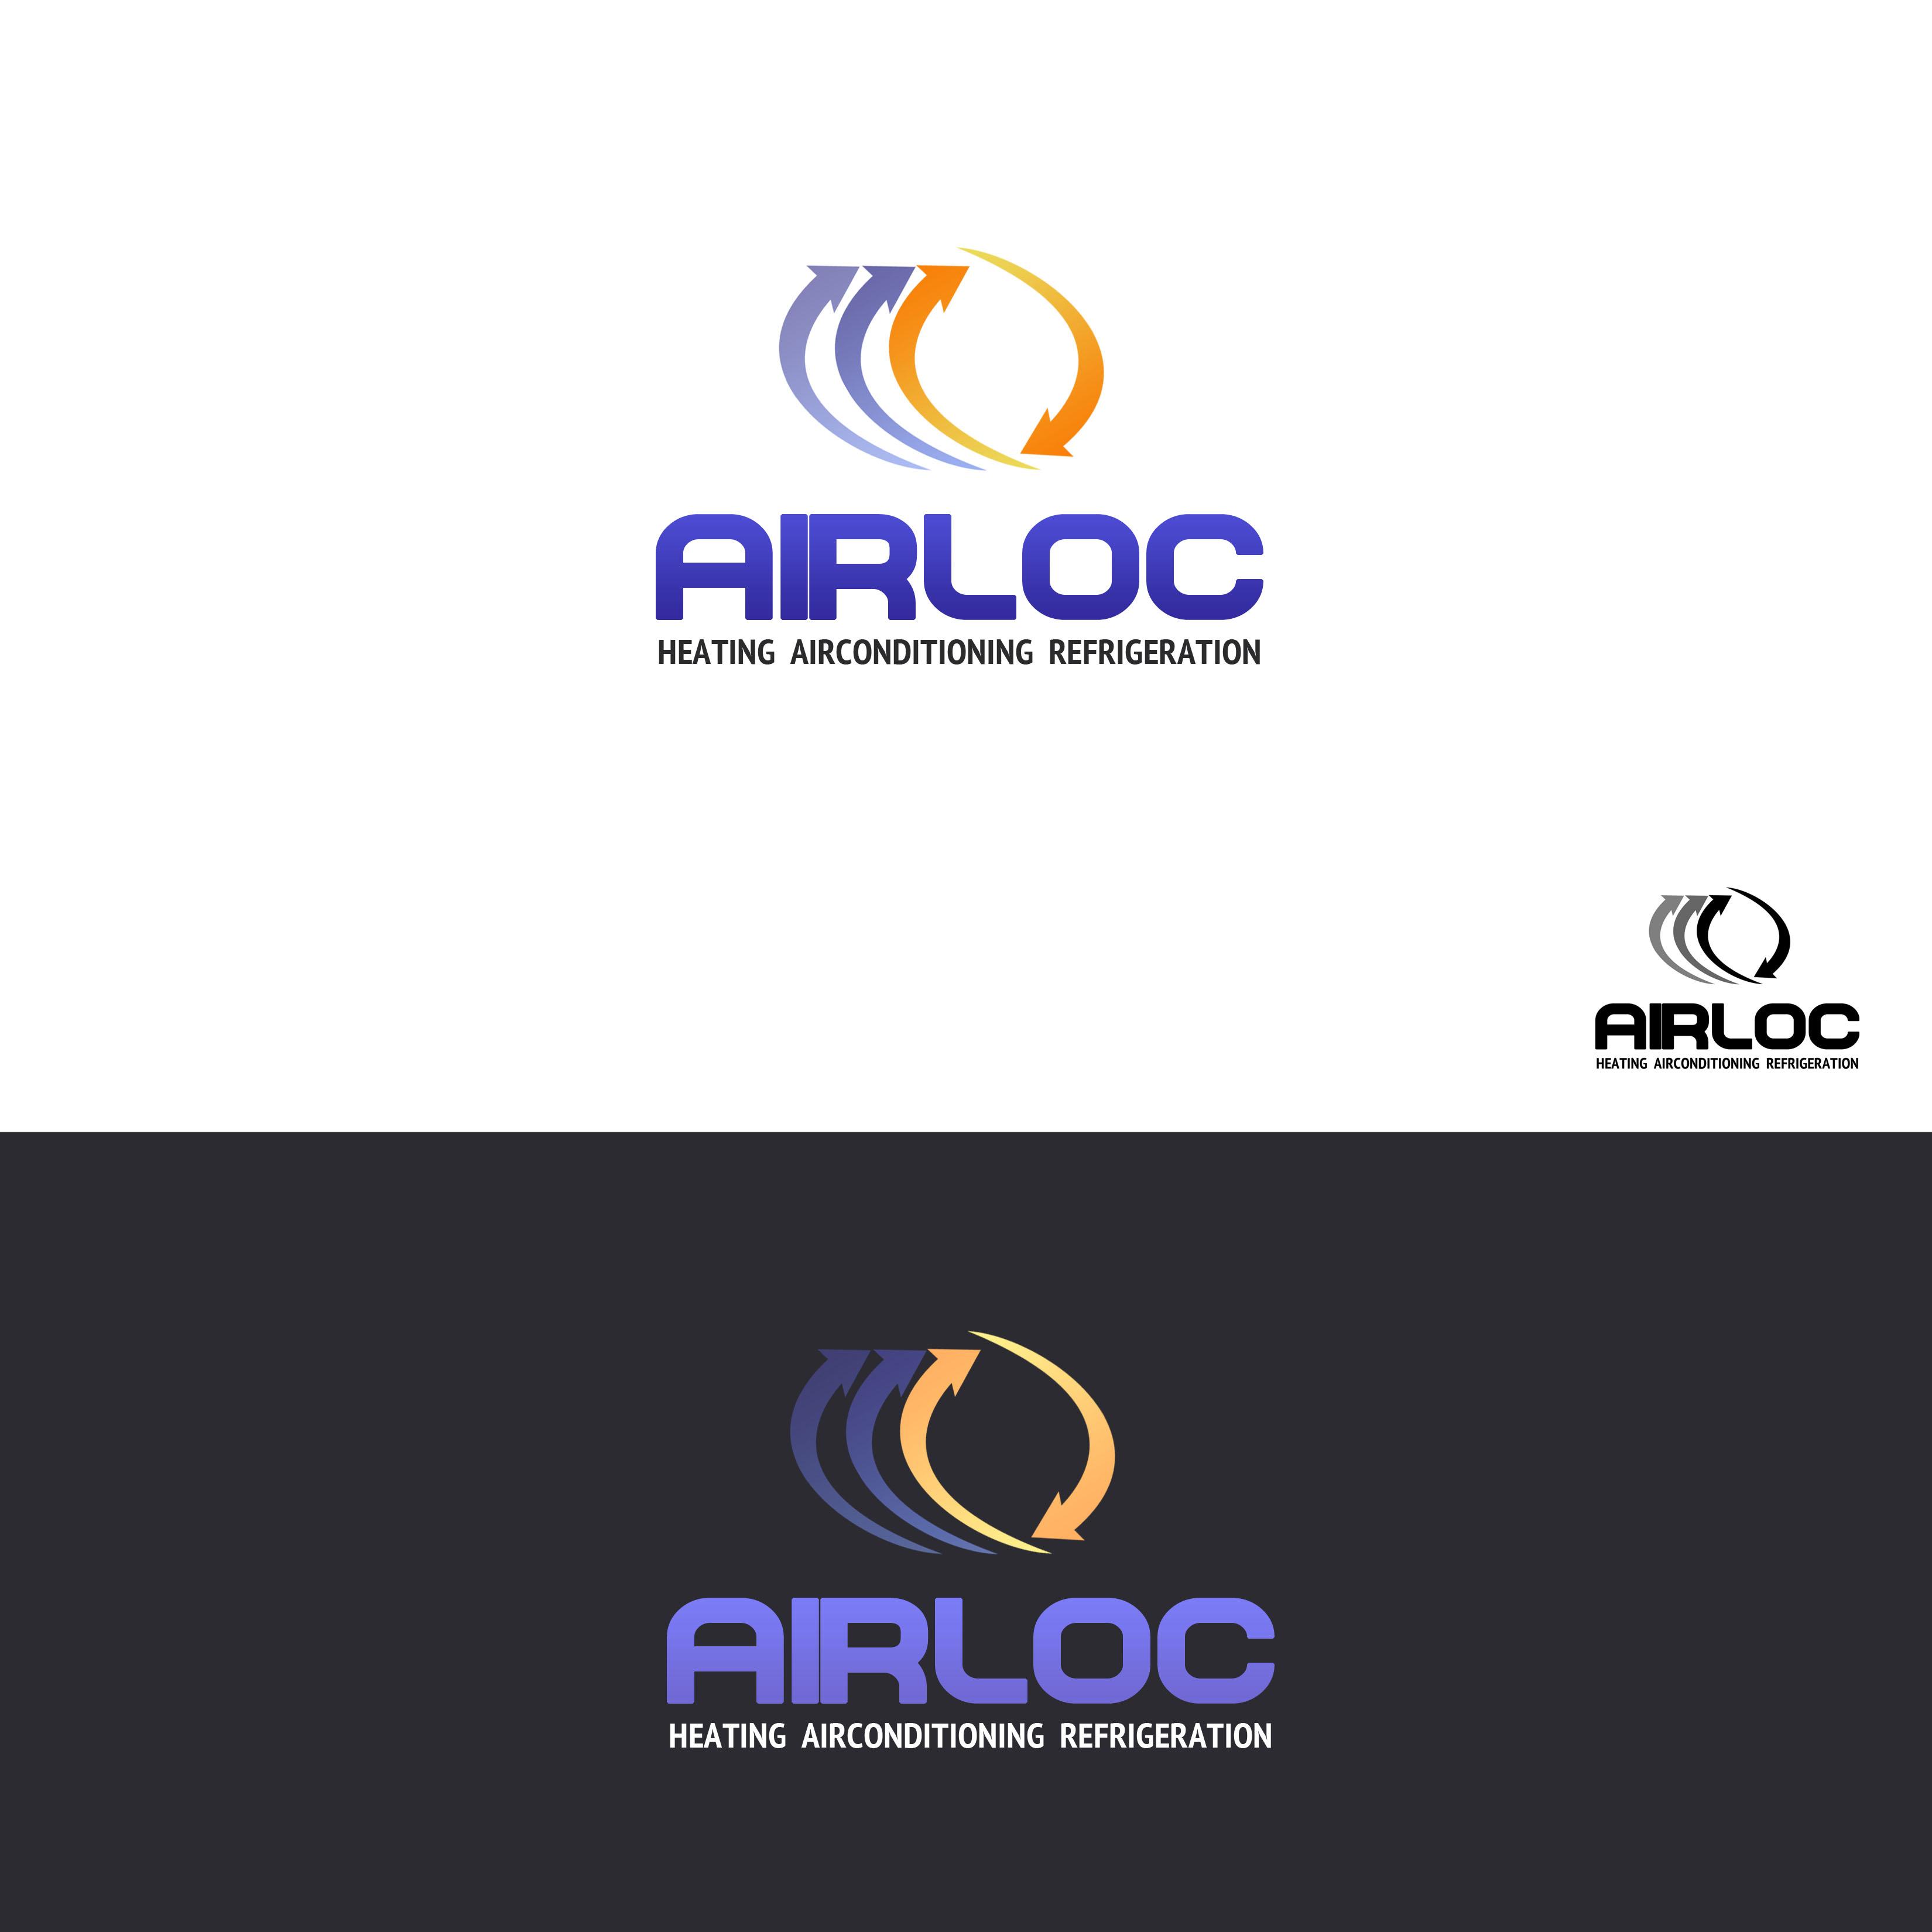 Logo Design by Allan Esclamado - Entry No. 18 in the Logo Design Contest Airloc Logo Design.